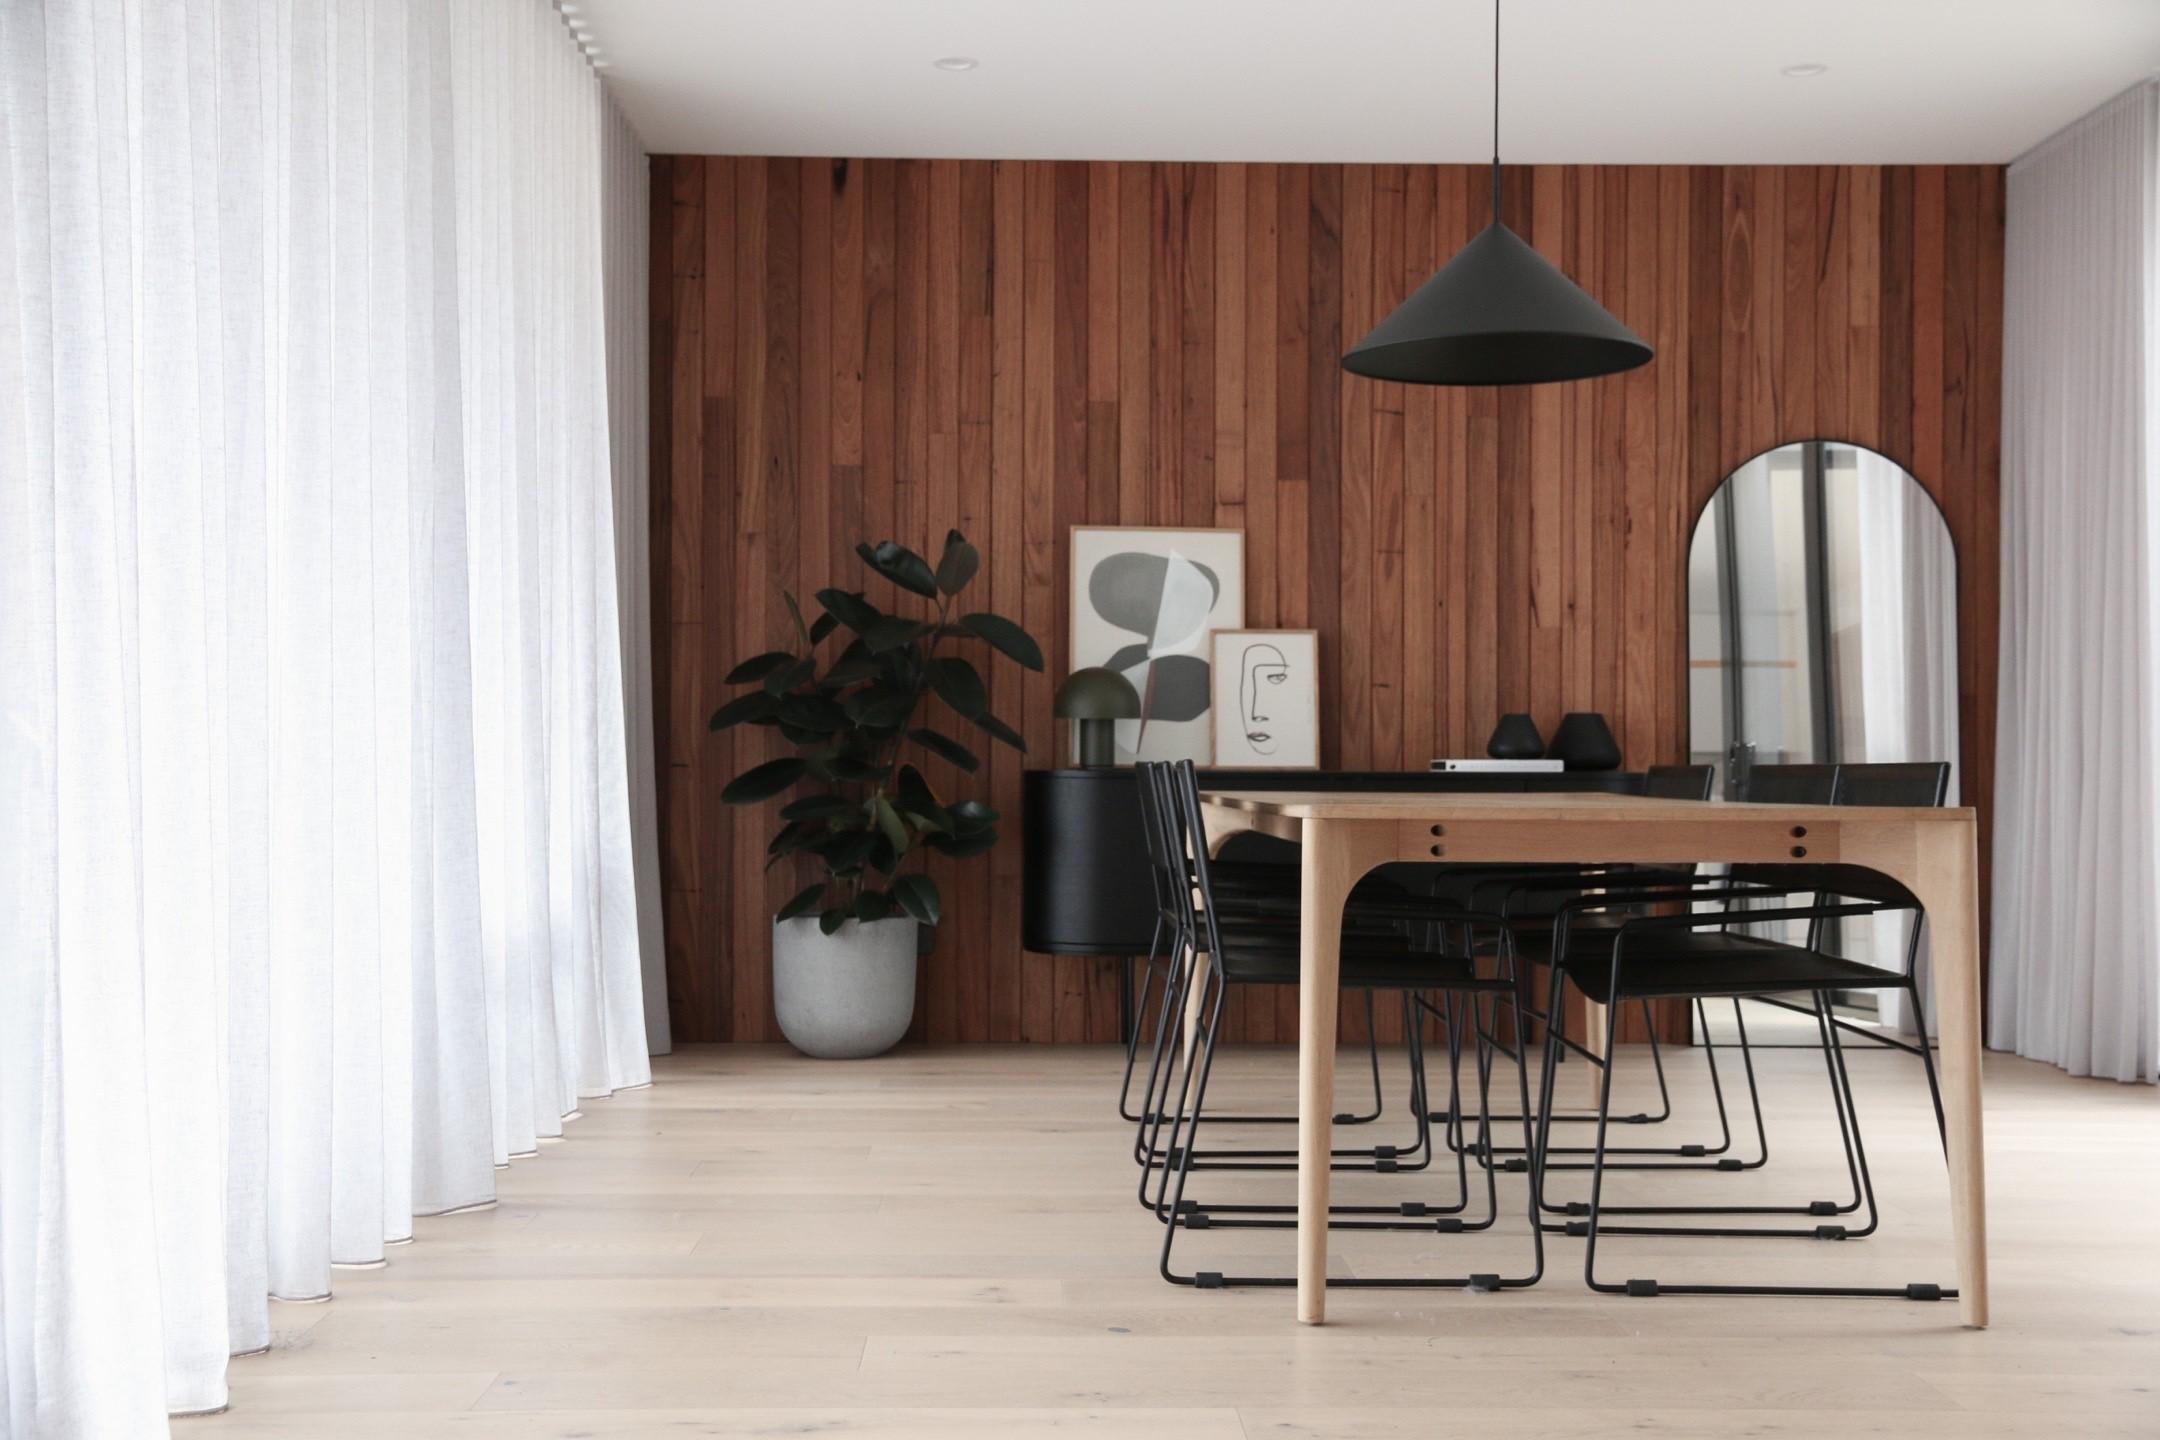 raydan-blair-interior-design-styling-dining-room